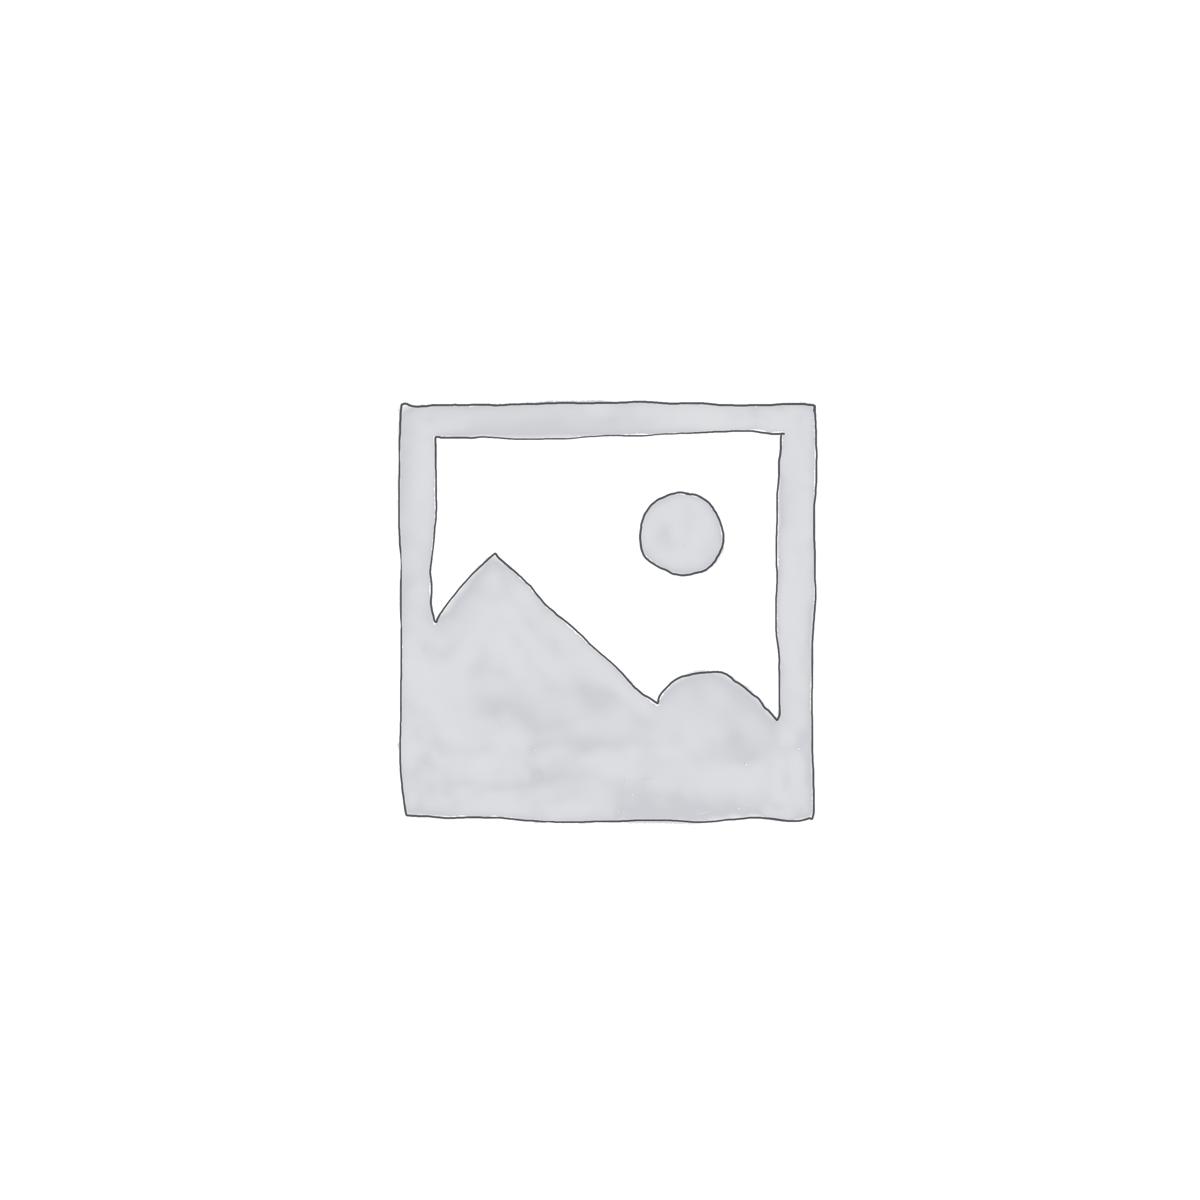 Misty Dark Forest Landscape Wallpaper Mural